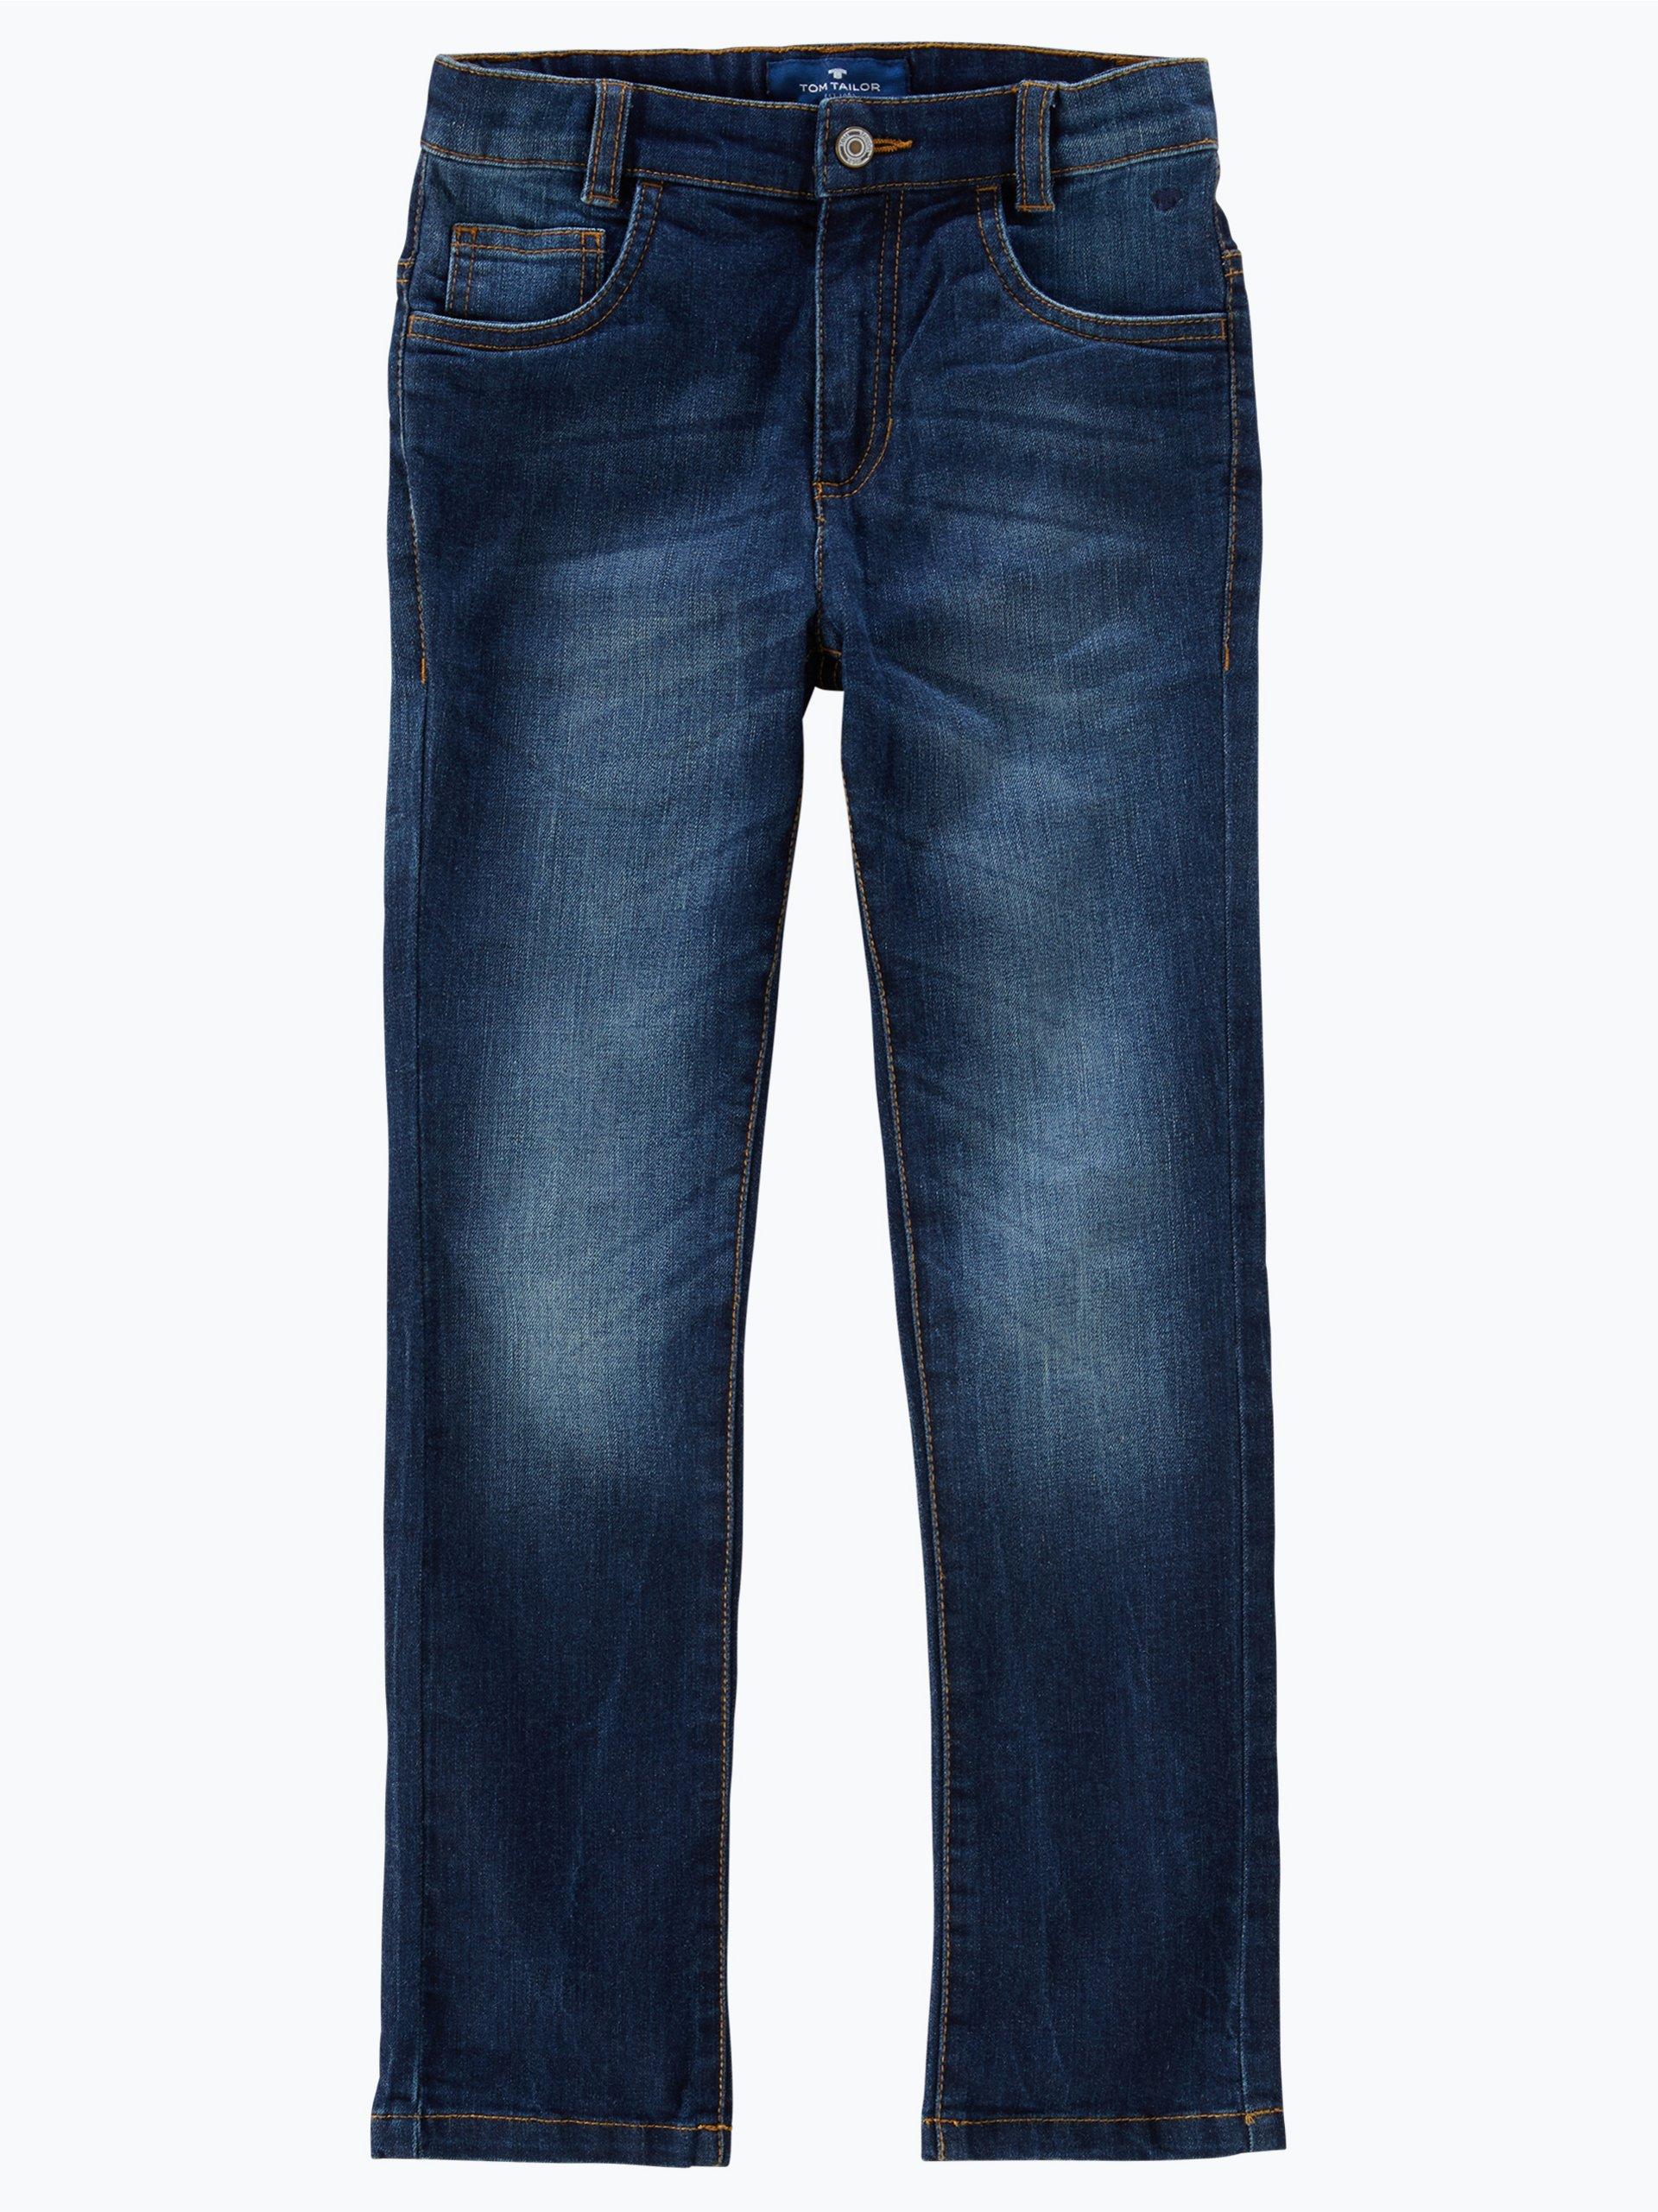 Tom Tailor Jungen Jeans - Matt Skinny Fit